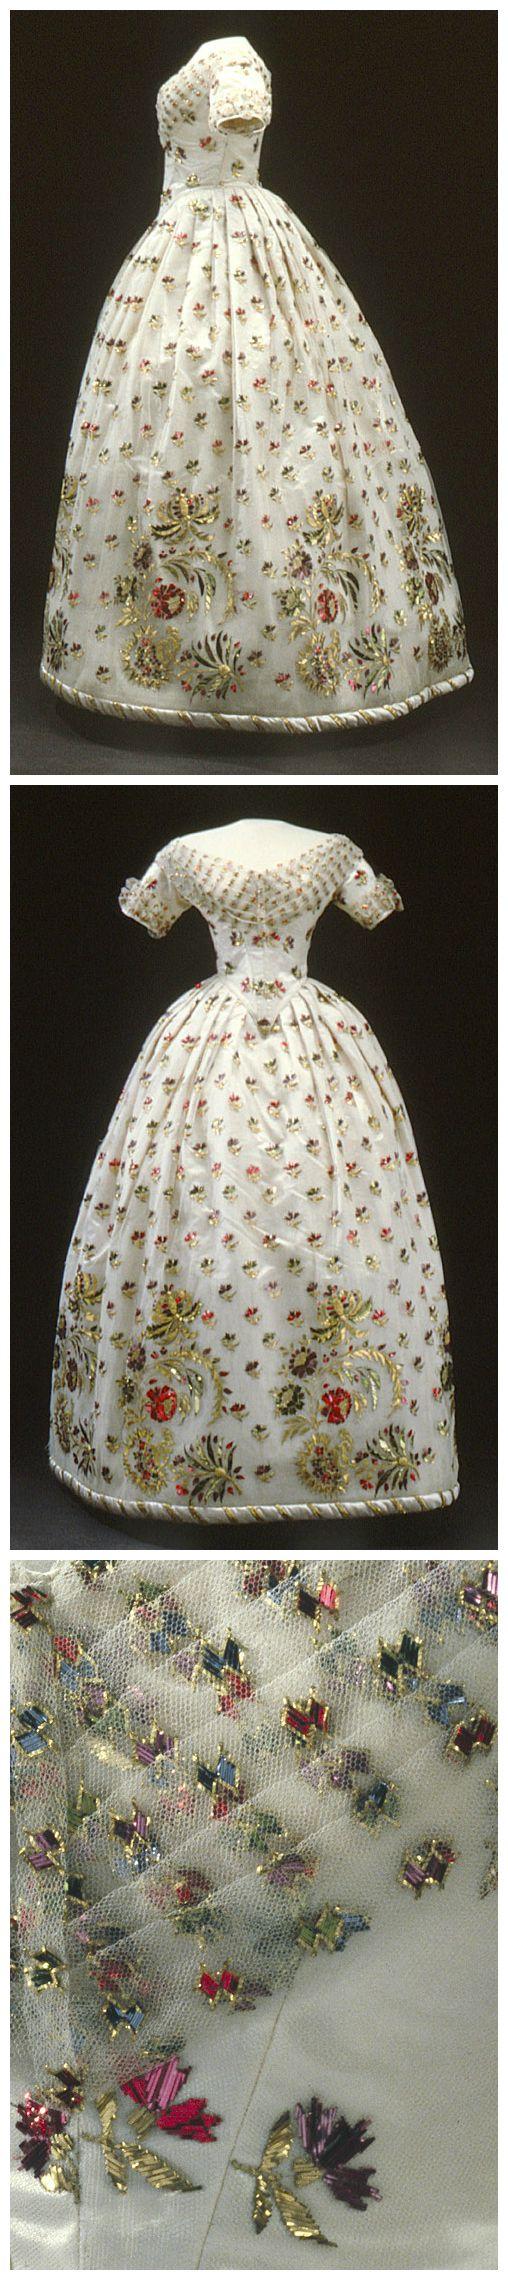 Gala dress, possibly worn by Princess Eugénie of Sweden (1830-89), 1840s, Royal Armory, Stockholm.